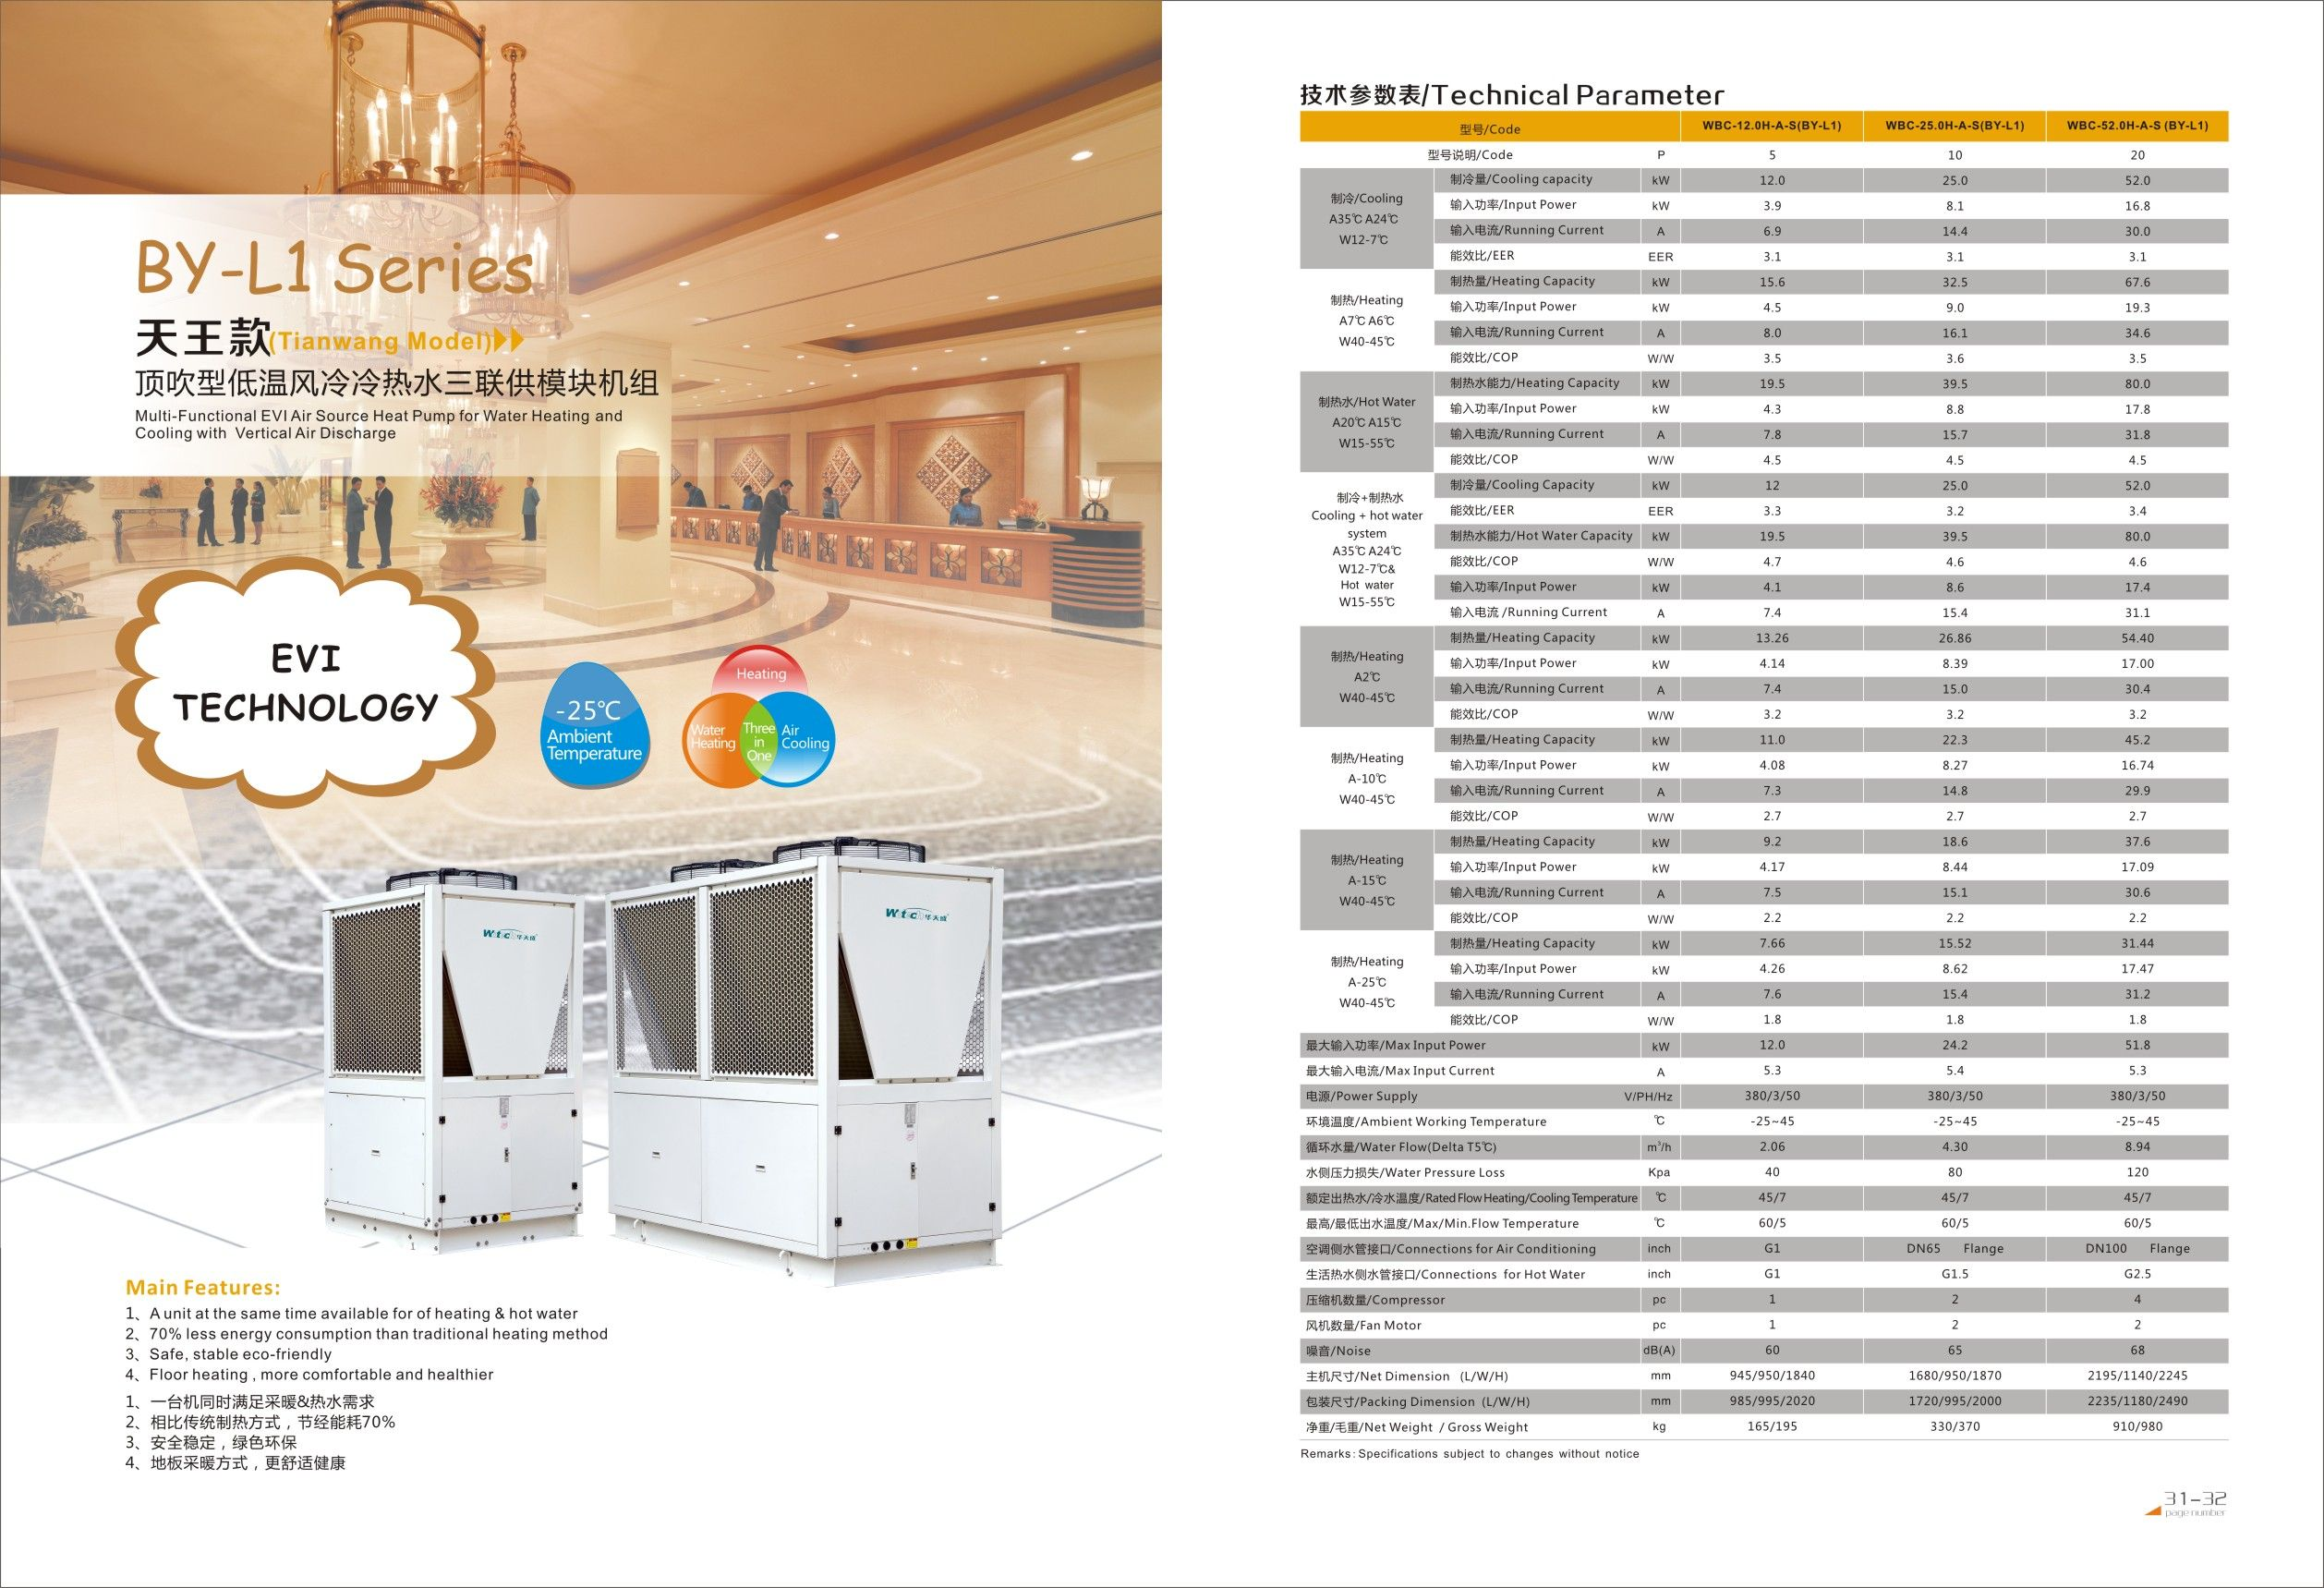 Wotech Heat Pump By L1 Series Evi Technology Multi Functional Evi